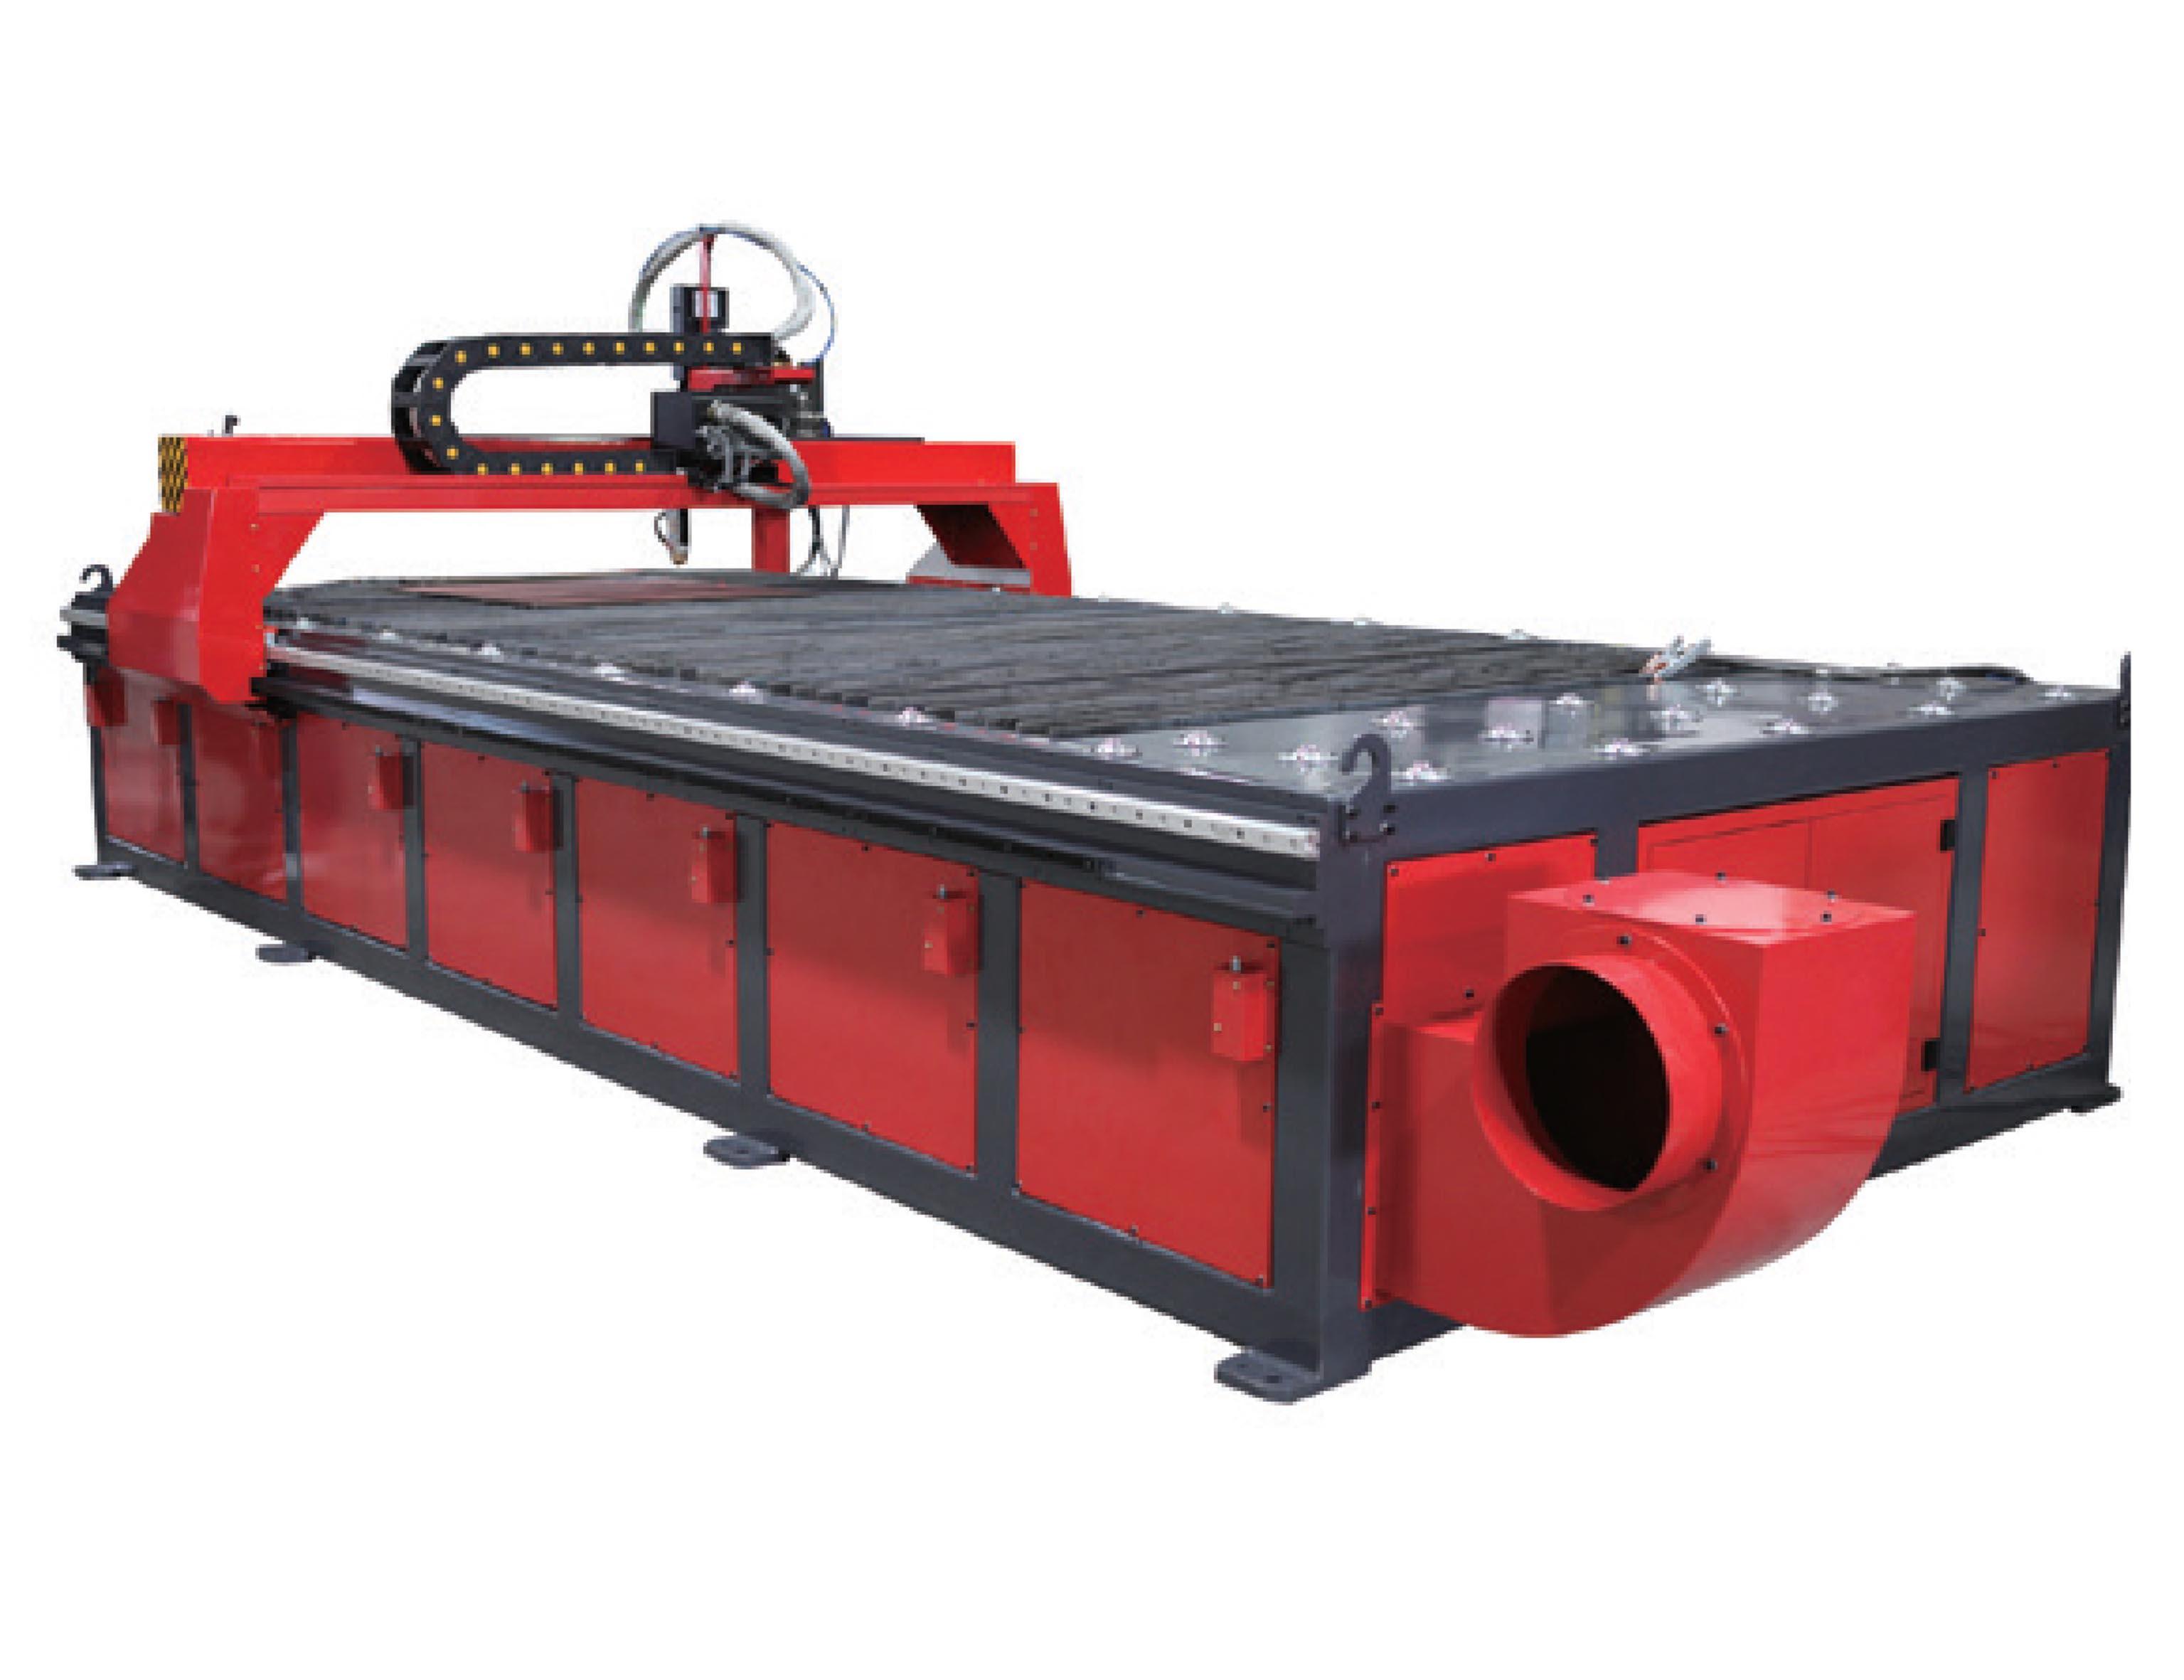 Small TMG Table model high-speed precision CNC plasma cutting machine image